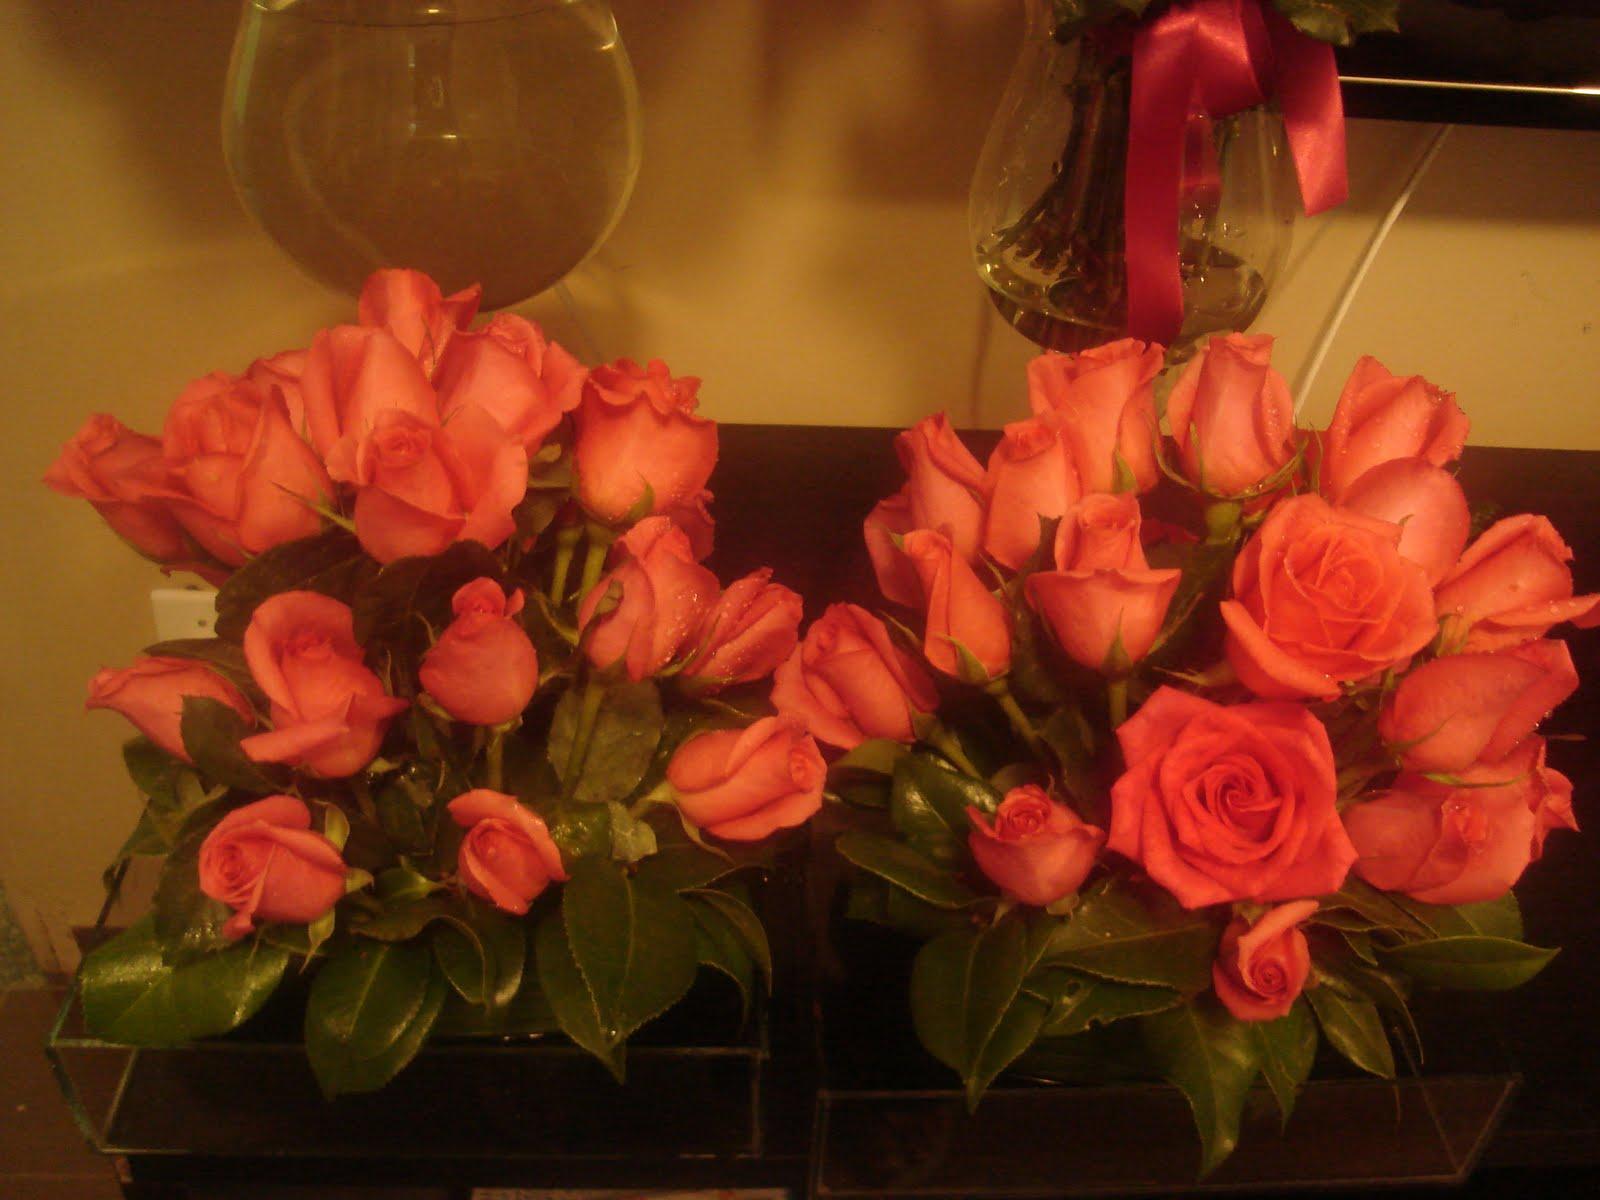 Arranjos   Rosas Pink Para Serem Colocados Nas Mesas De Convidados